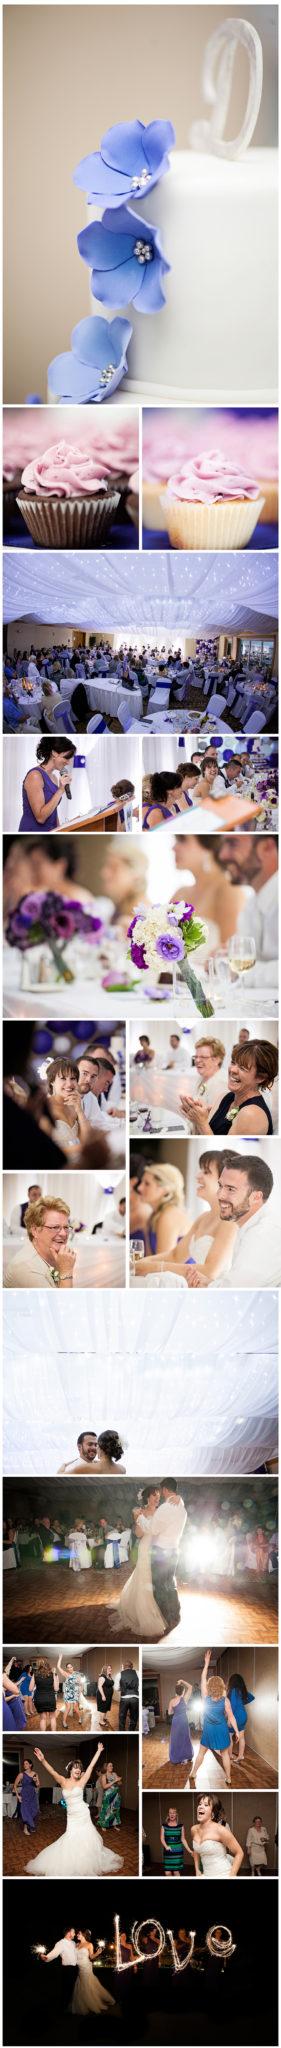 danielle_david_nova_scotia_wedding_photography_3